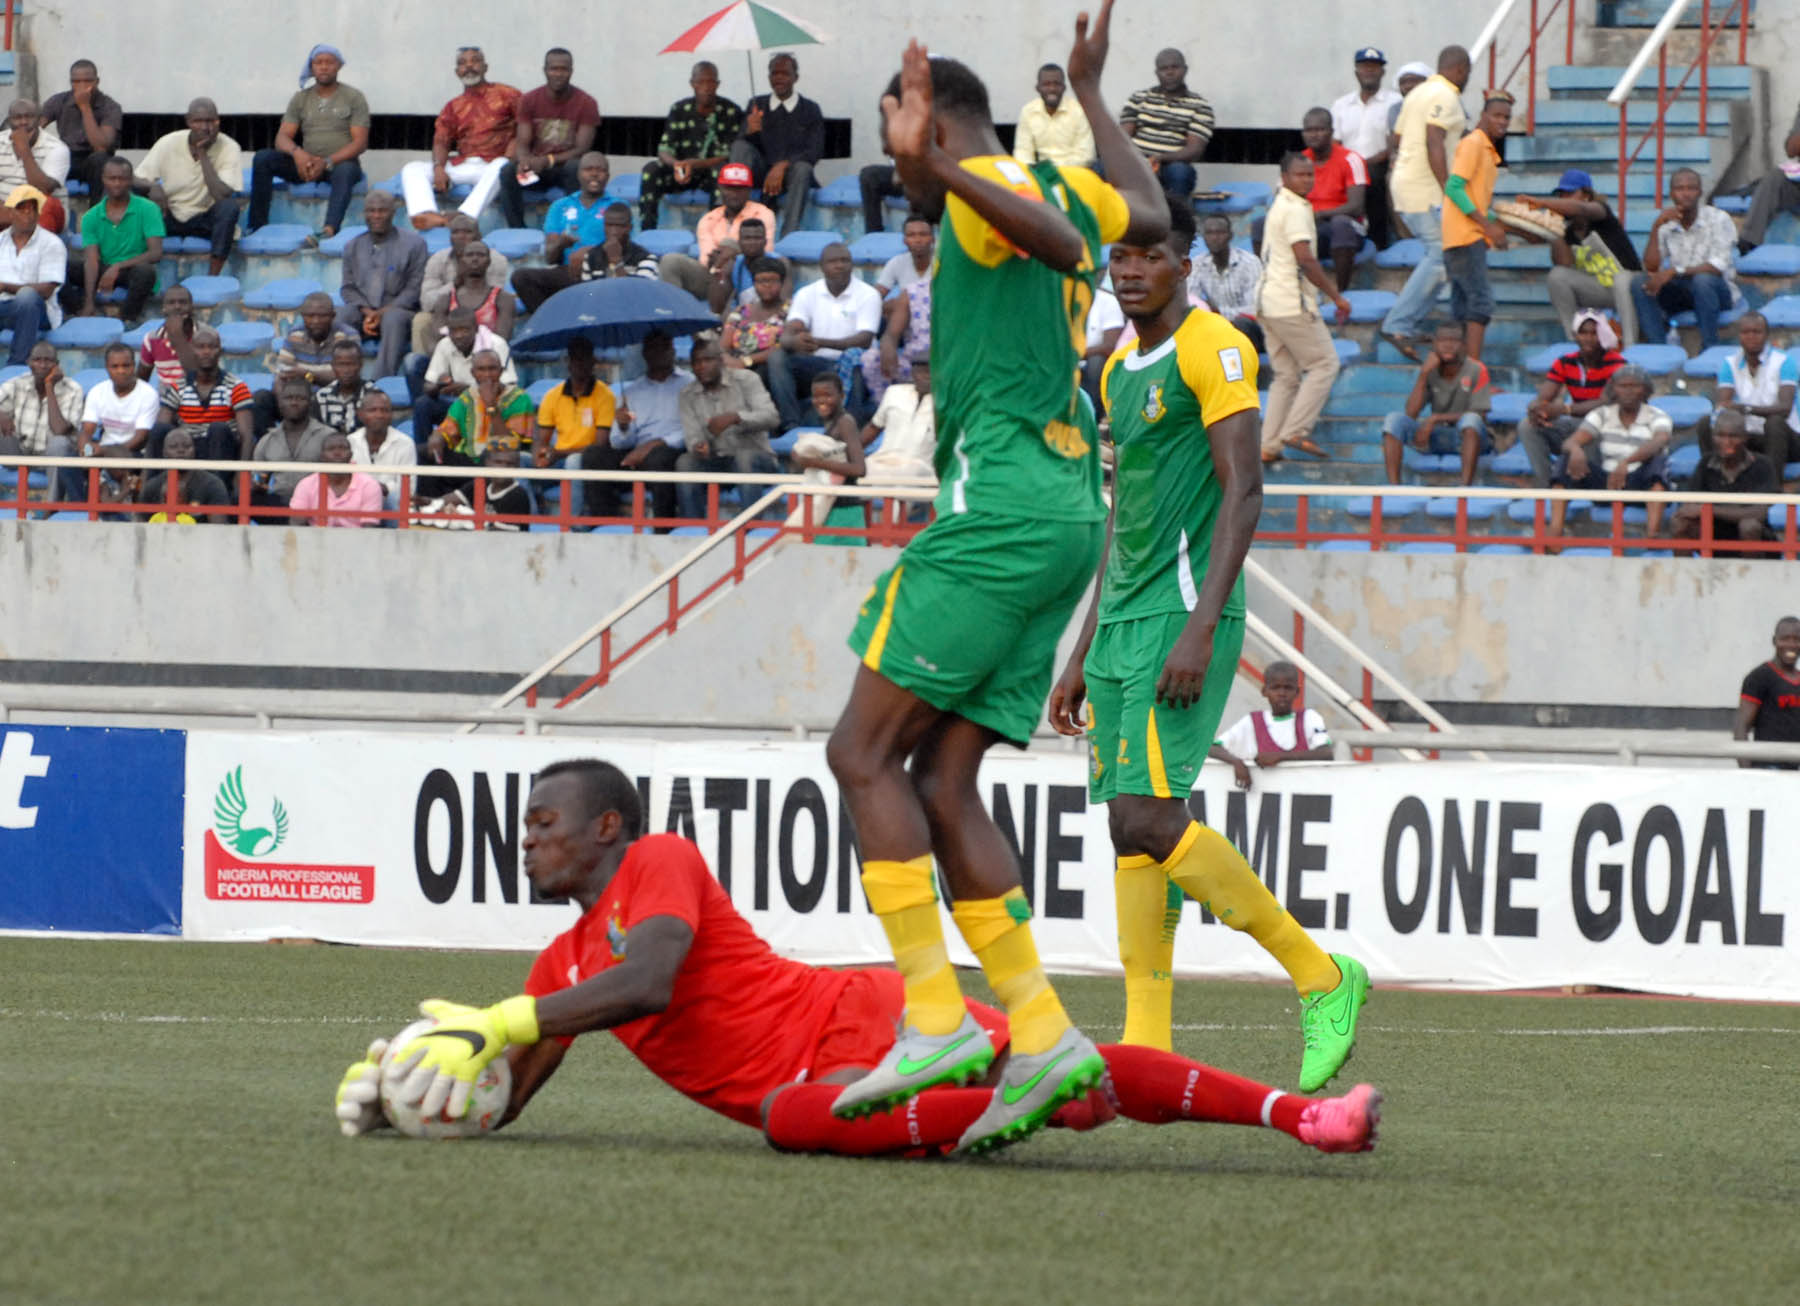 NPFL: Rangers, Wolves Clash InFridayNight Football; 3SC Host IfeanyiUbah